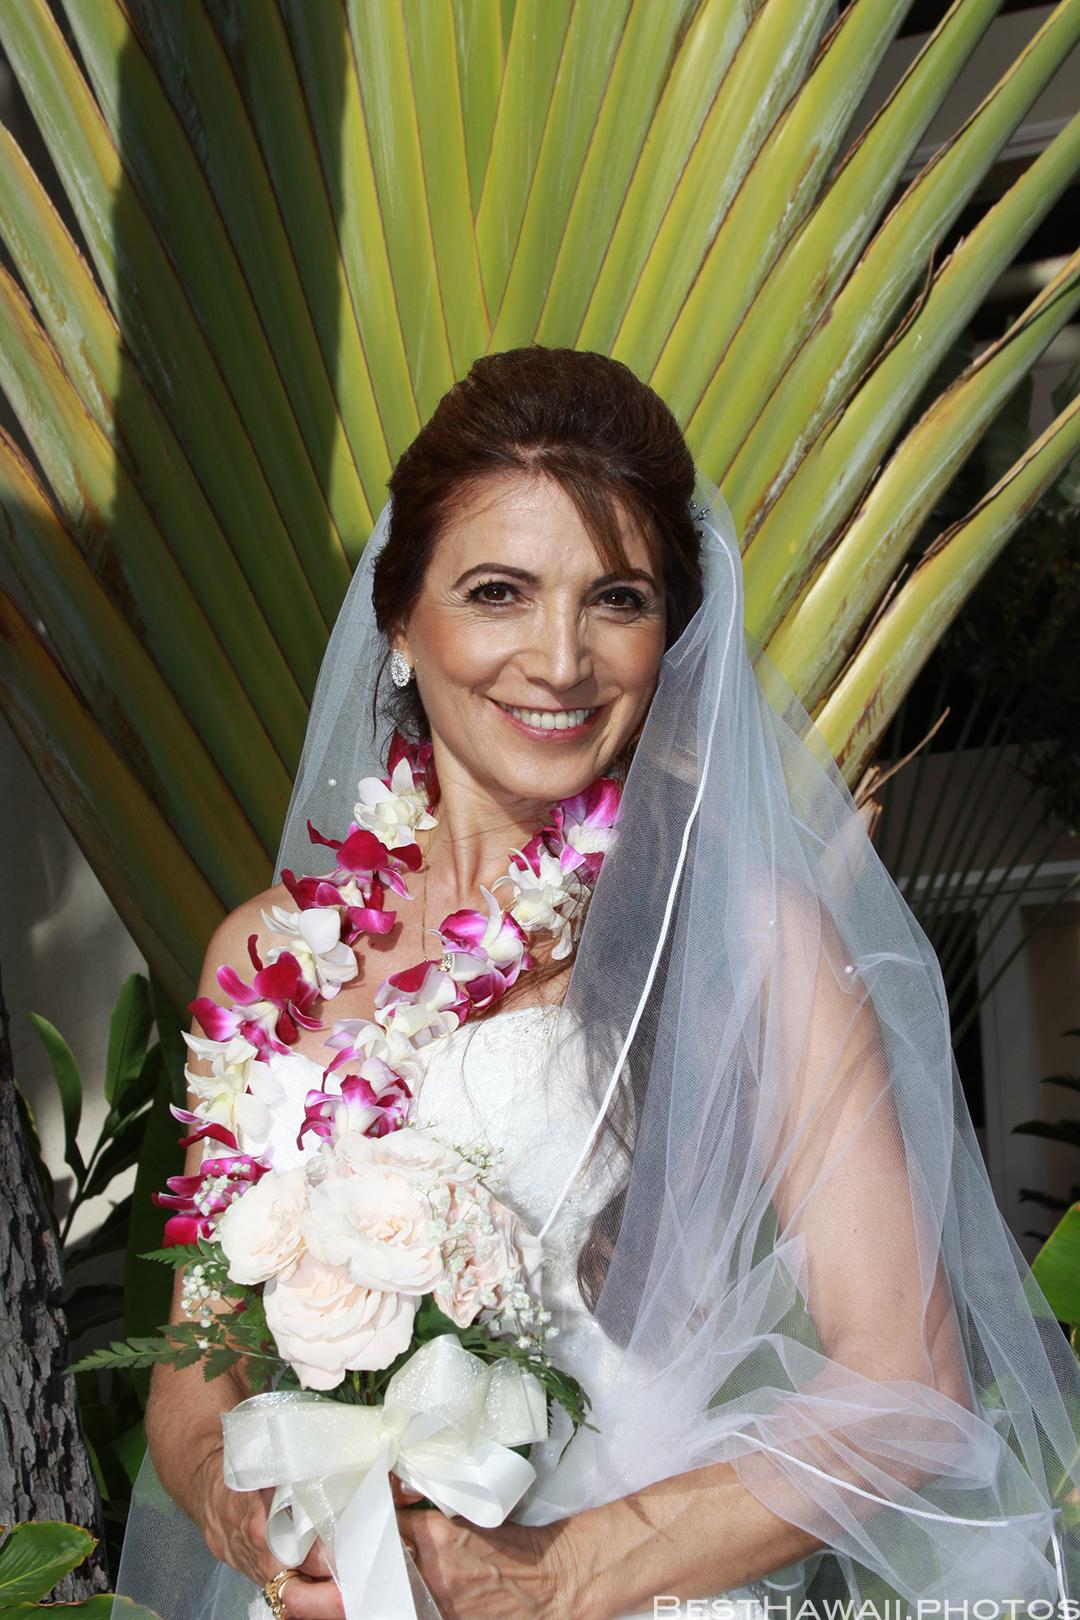 Wedding Photos at Hilton Hawaiian Village by Pasha www.BestHawaii.photos 121820158641